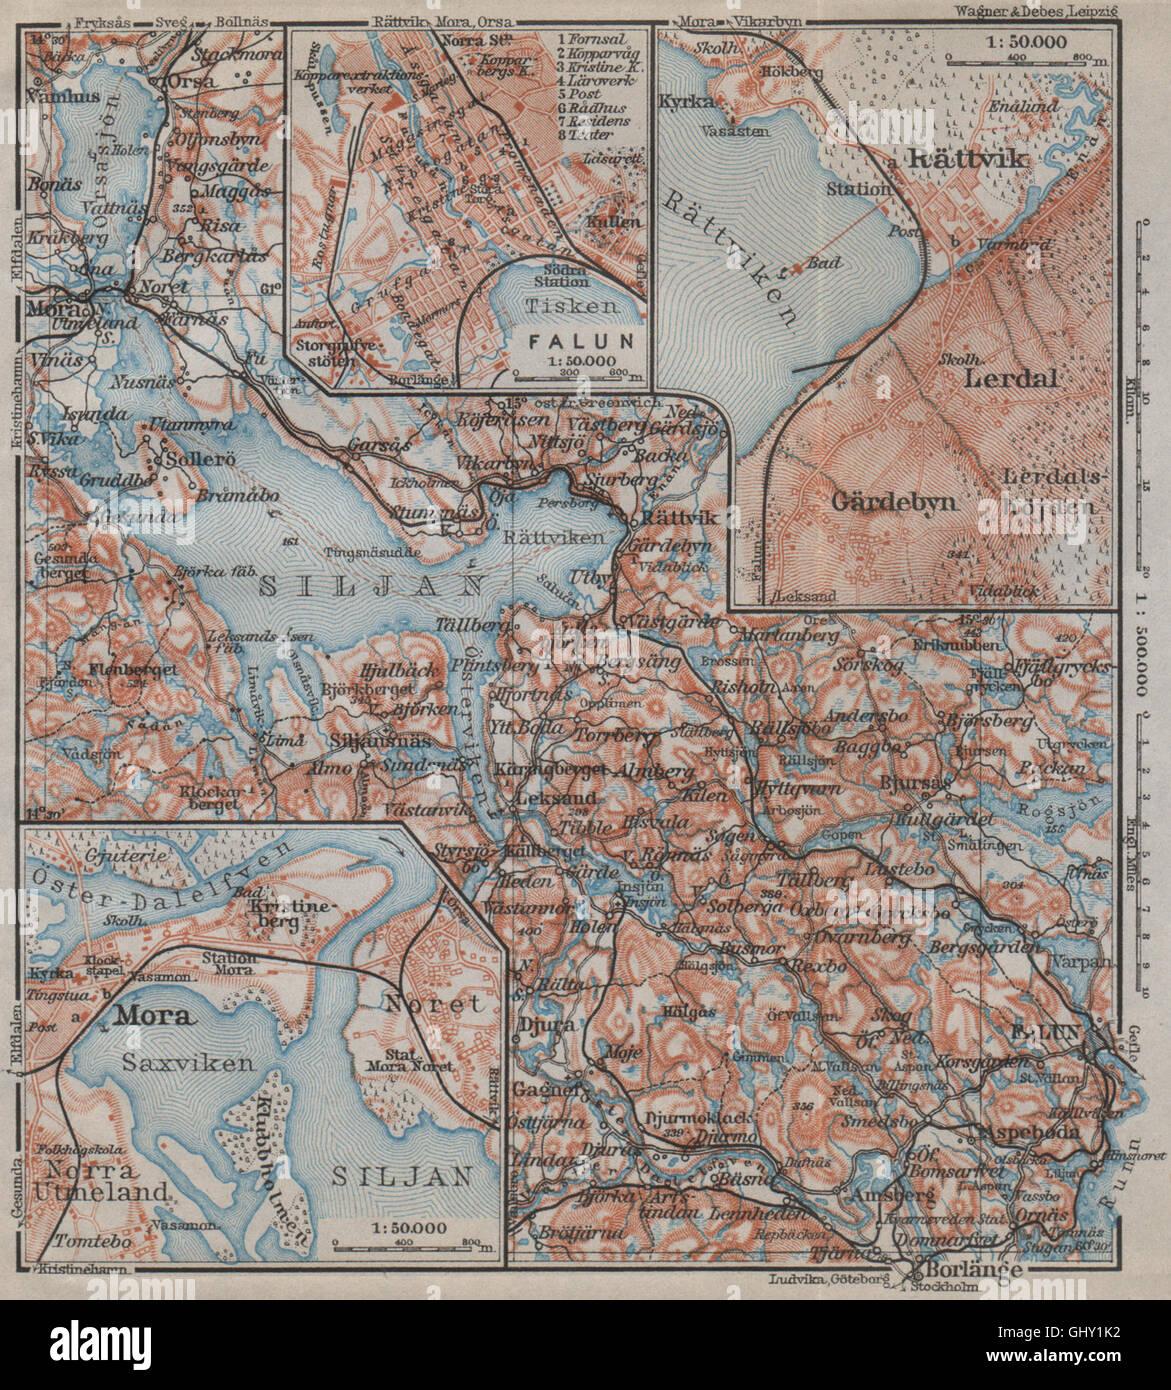 LAKE SILJAN REGION Rättvik Falun Mora Town Plans Sweden Karta - Sweden map mora